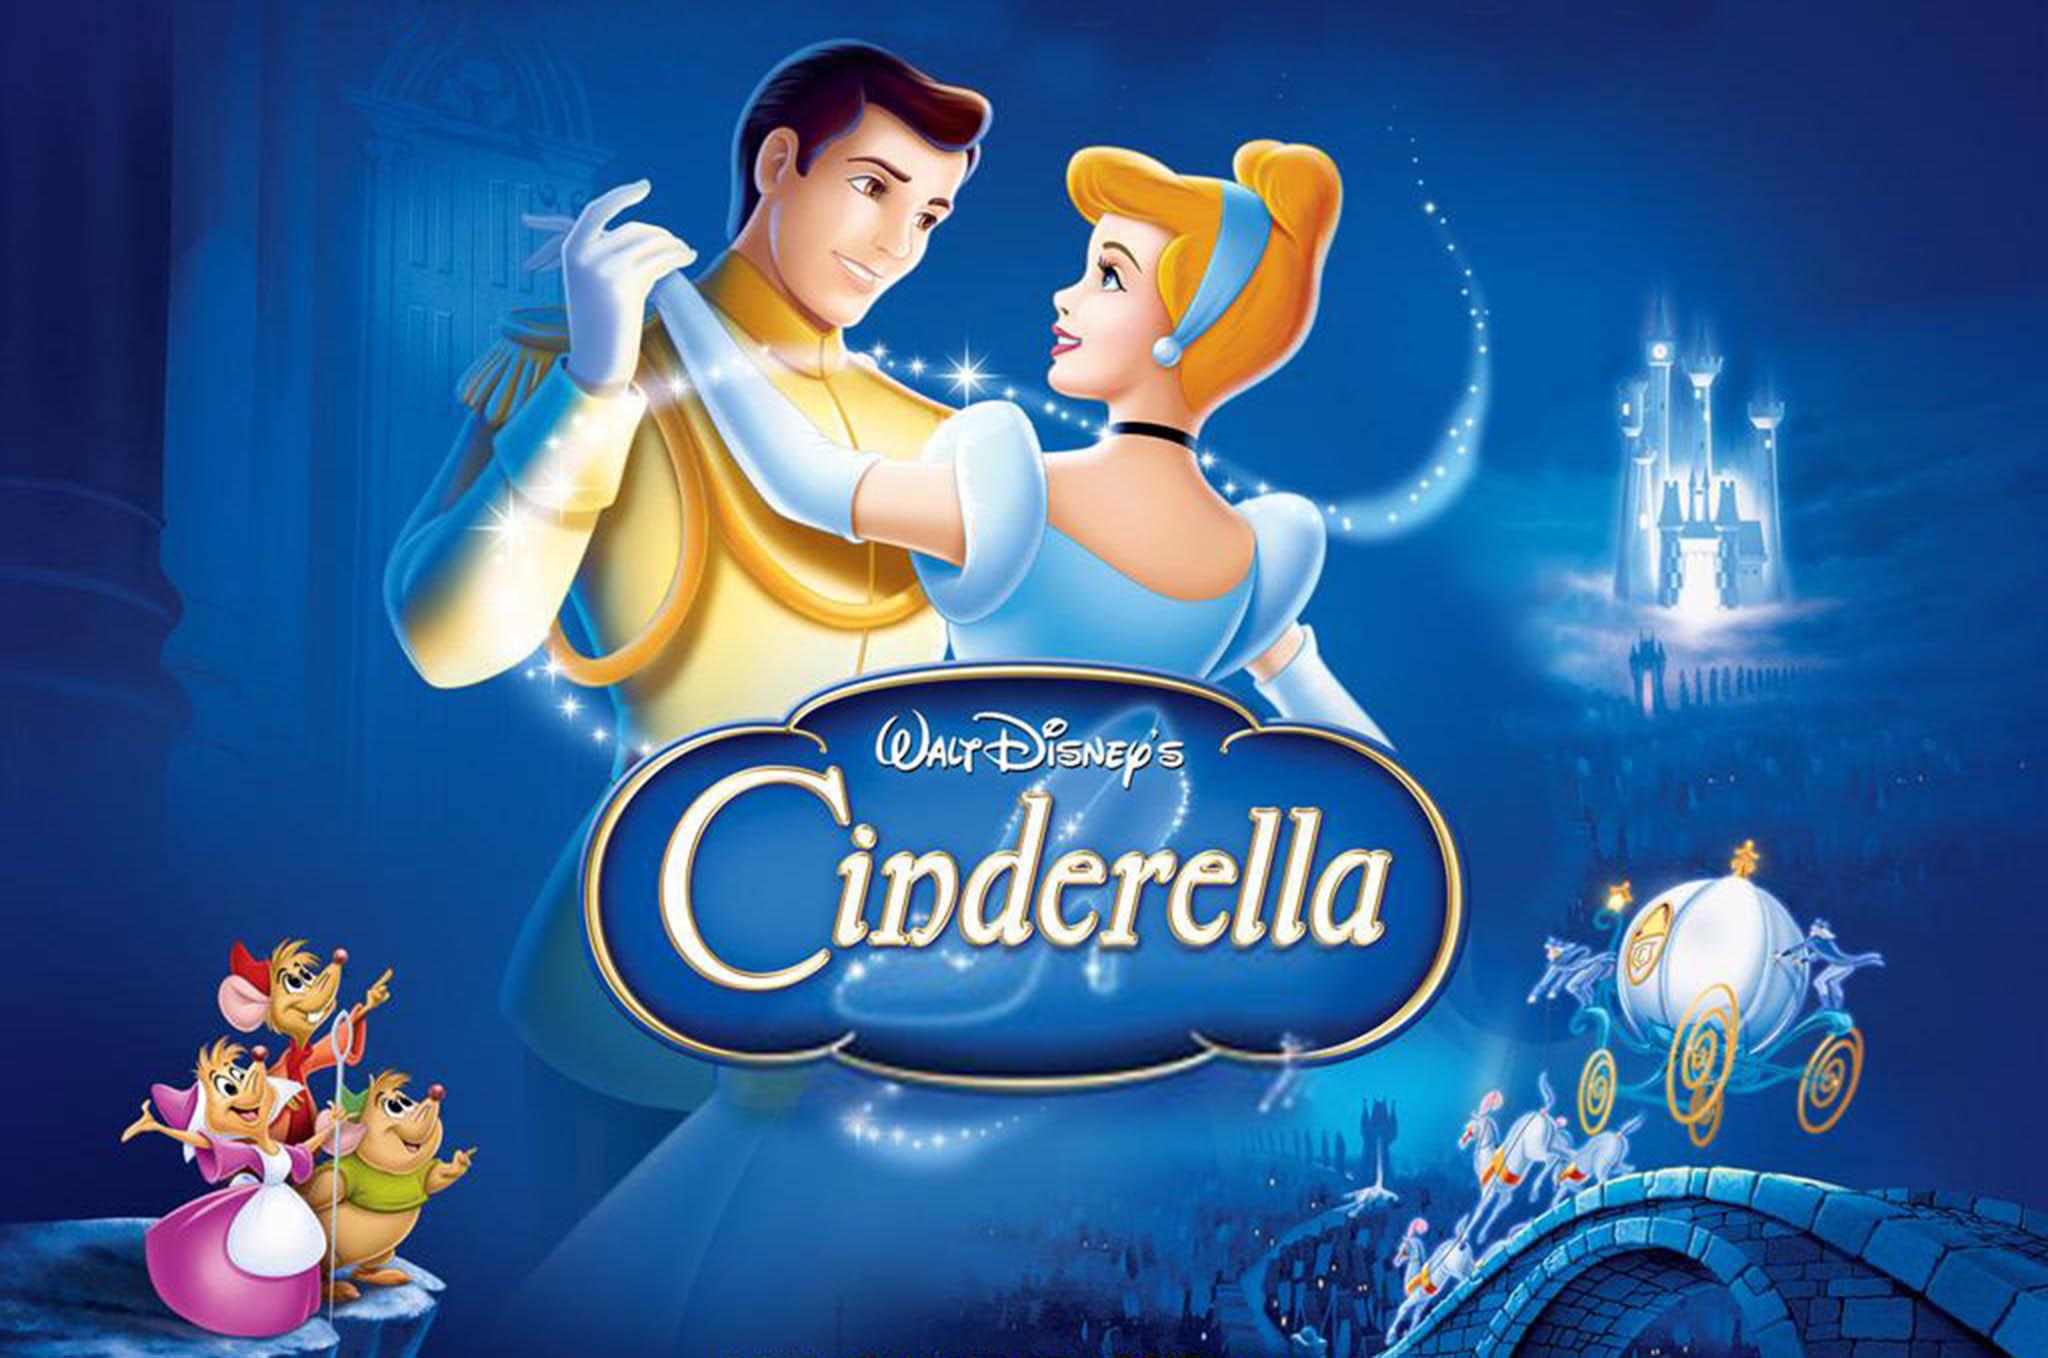 Cinderella : ซินเดอเรลล่า